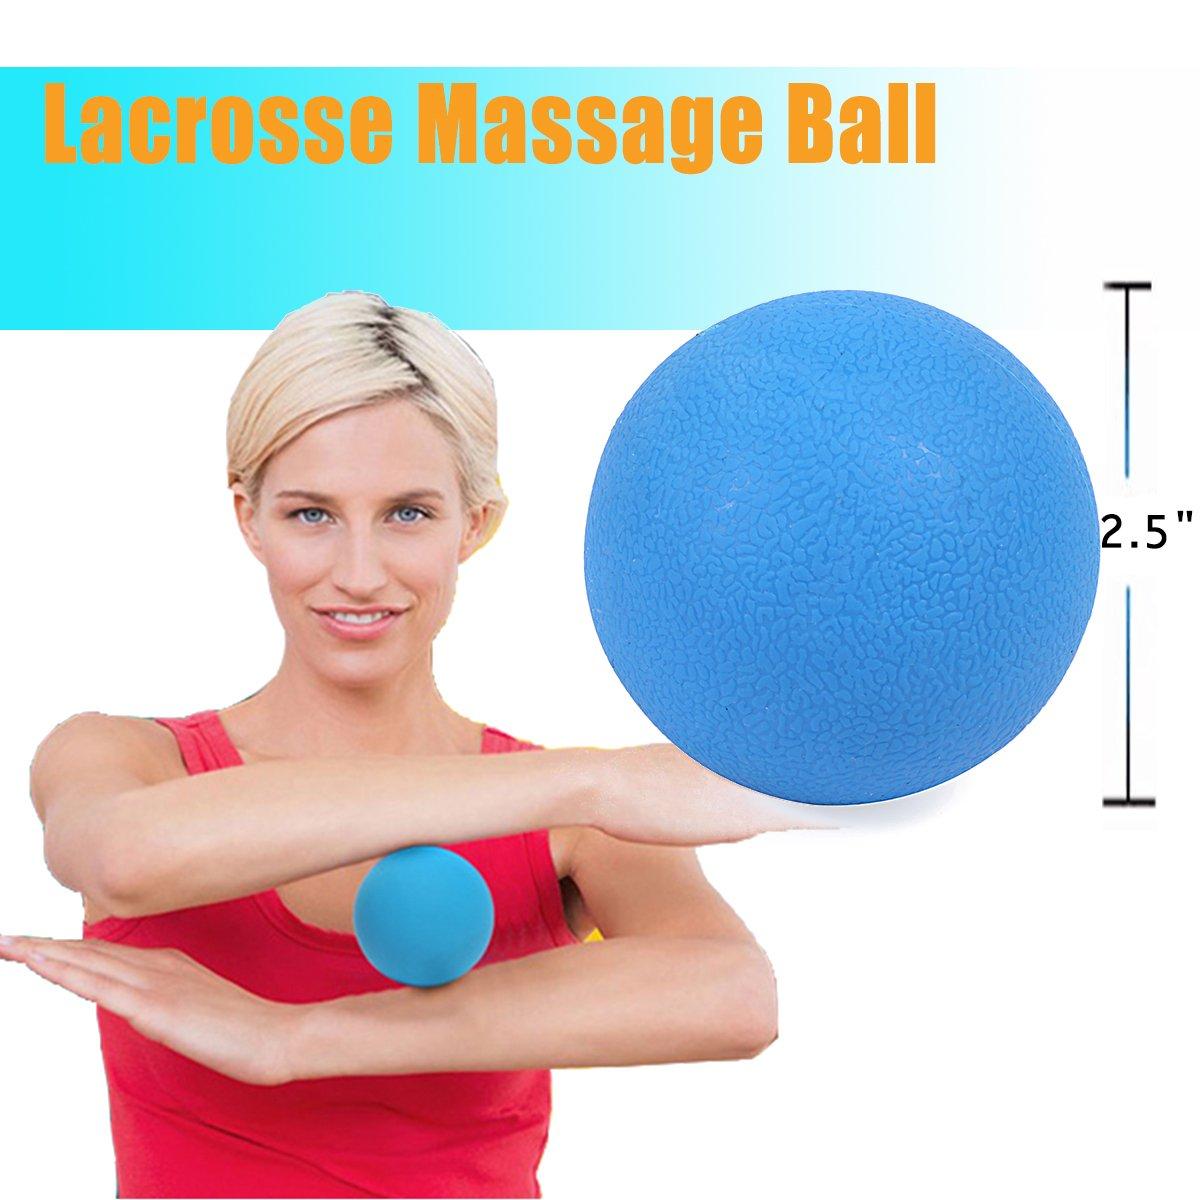 Massageball Erdnuss Linderung Schmerzen Yoga Übungen Lacrosse Myofascia Fitness